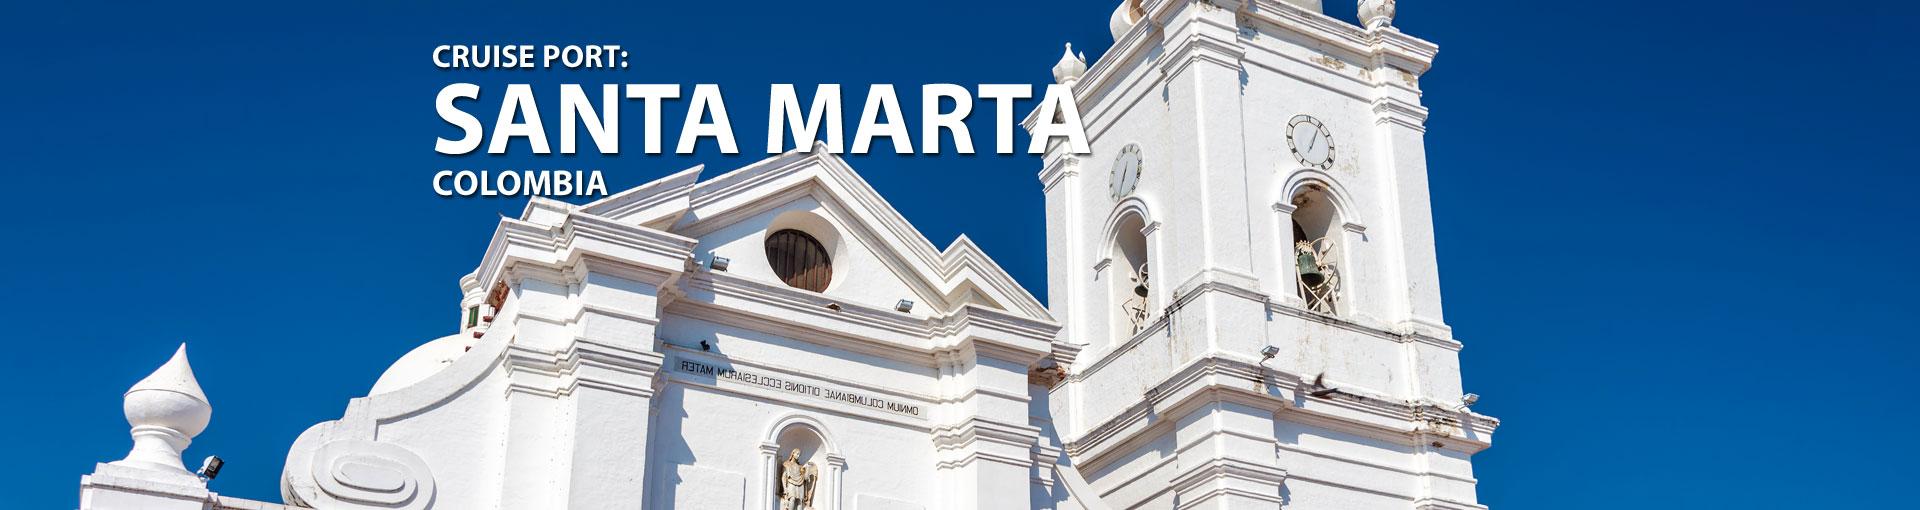 Cruises to Santa Marta, Colombia